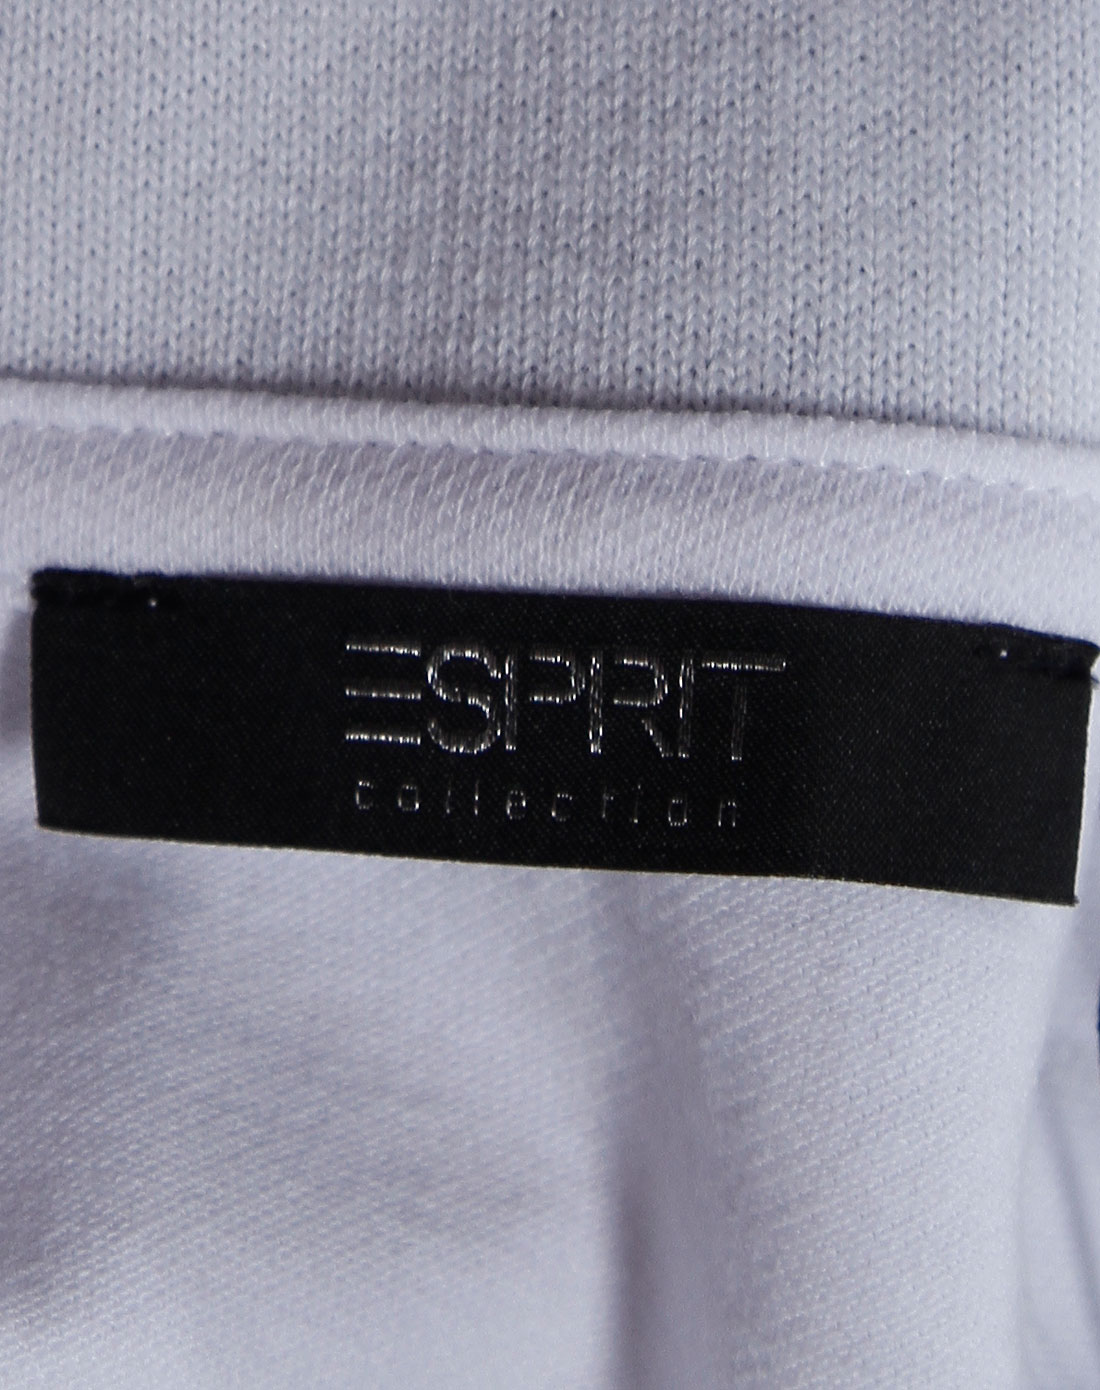 Esprit 男款纯白色短袖POLO衫 埃斯普利特Esprit官网特价2.5图片